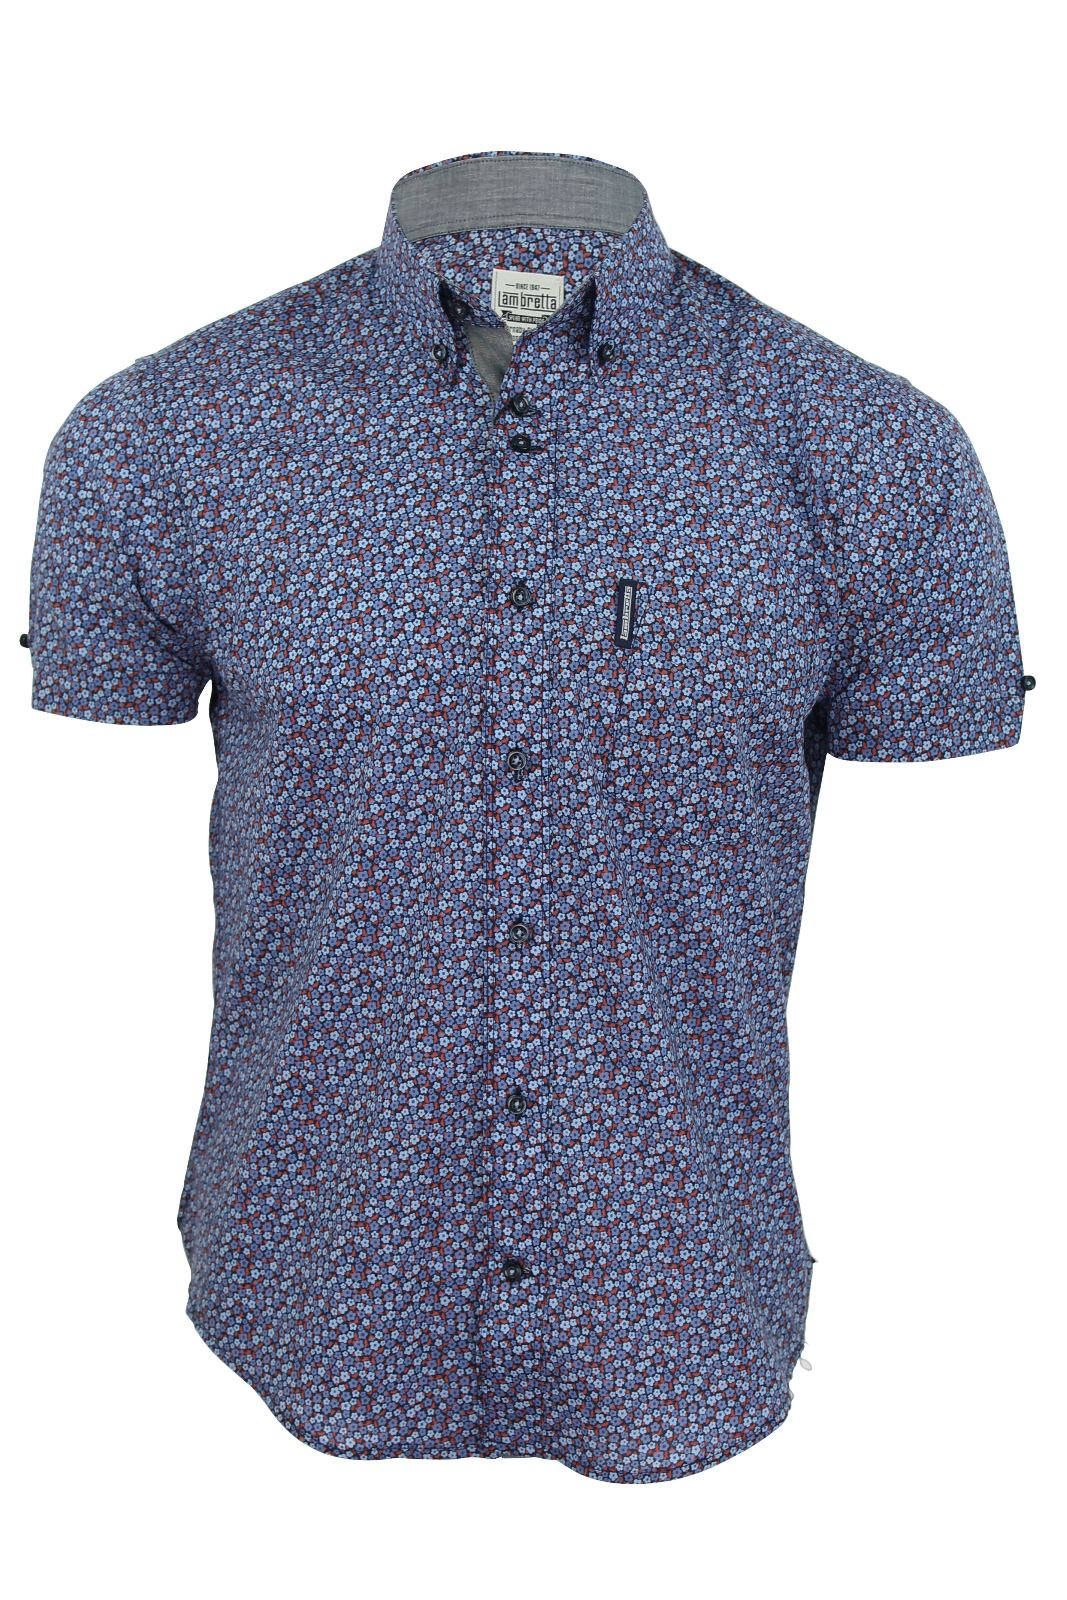 Mens shirt by lambretta floral print short sleeves cotton for Mens short sleeve floral shirt